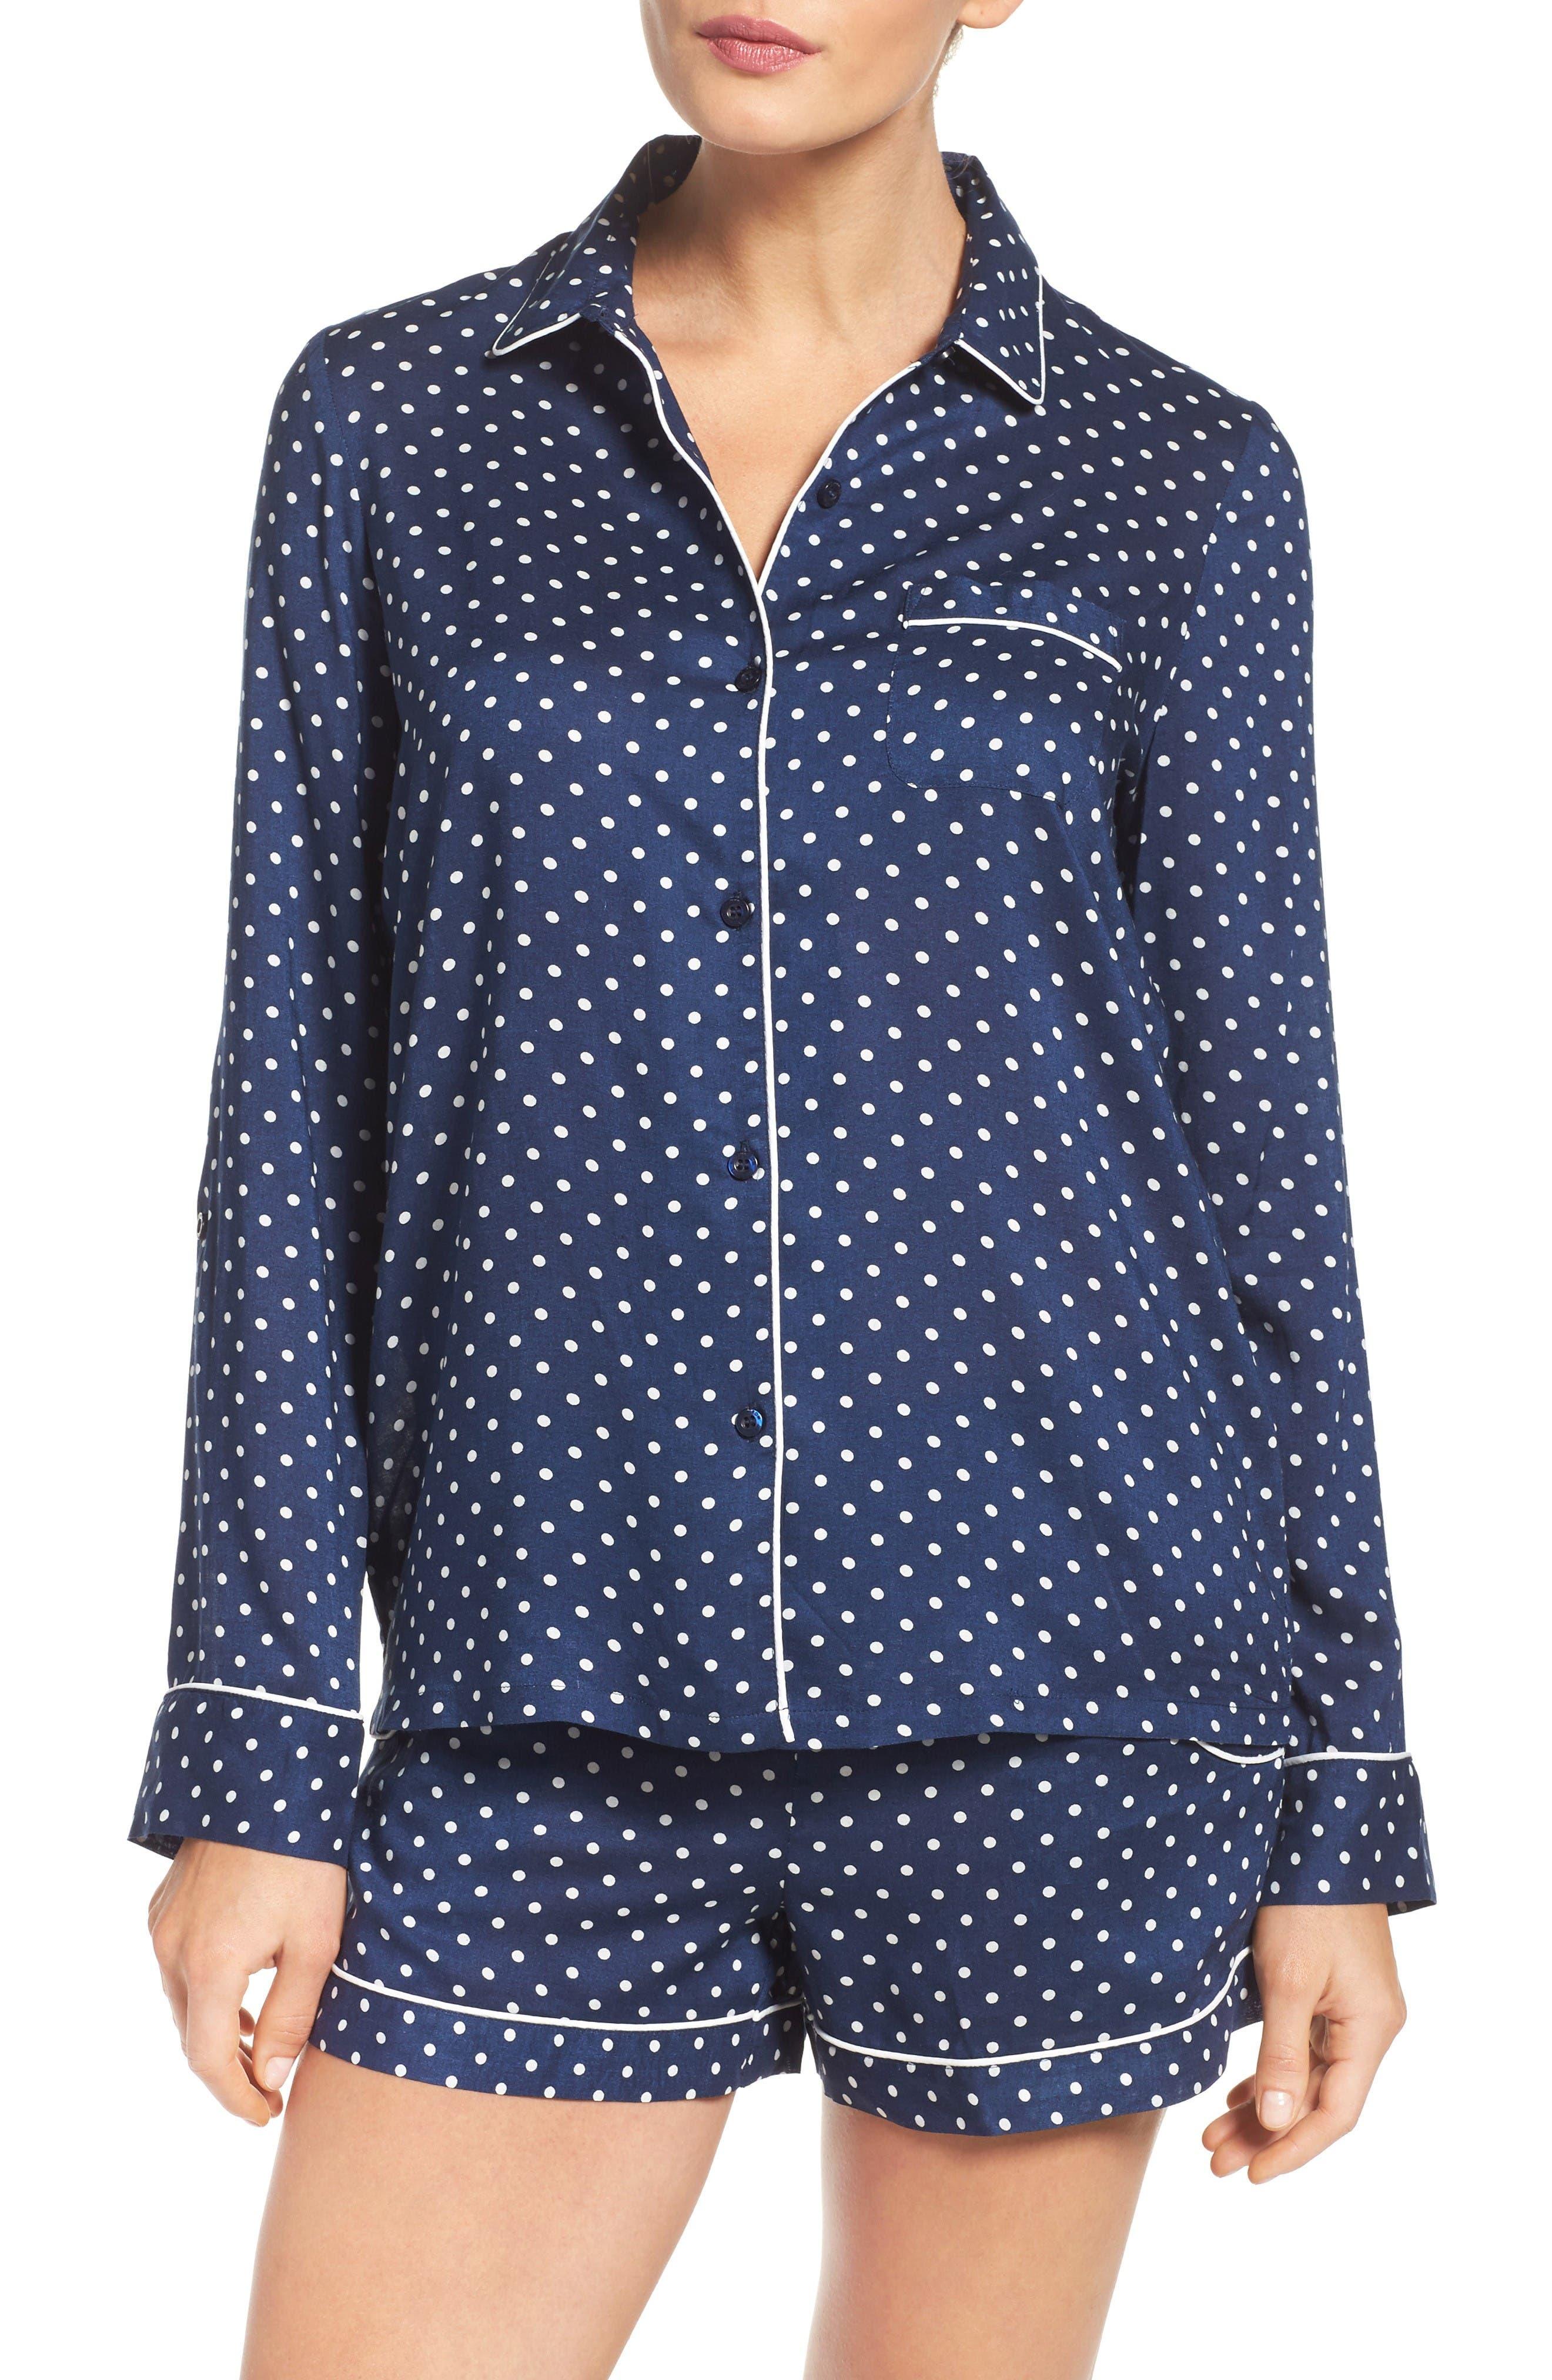 Alternate Image 1 Selected - Nordstrom Lingerie Woven Short Pajamas